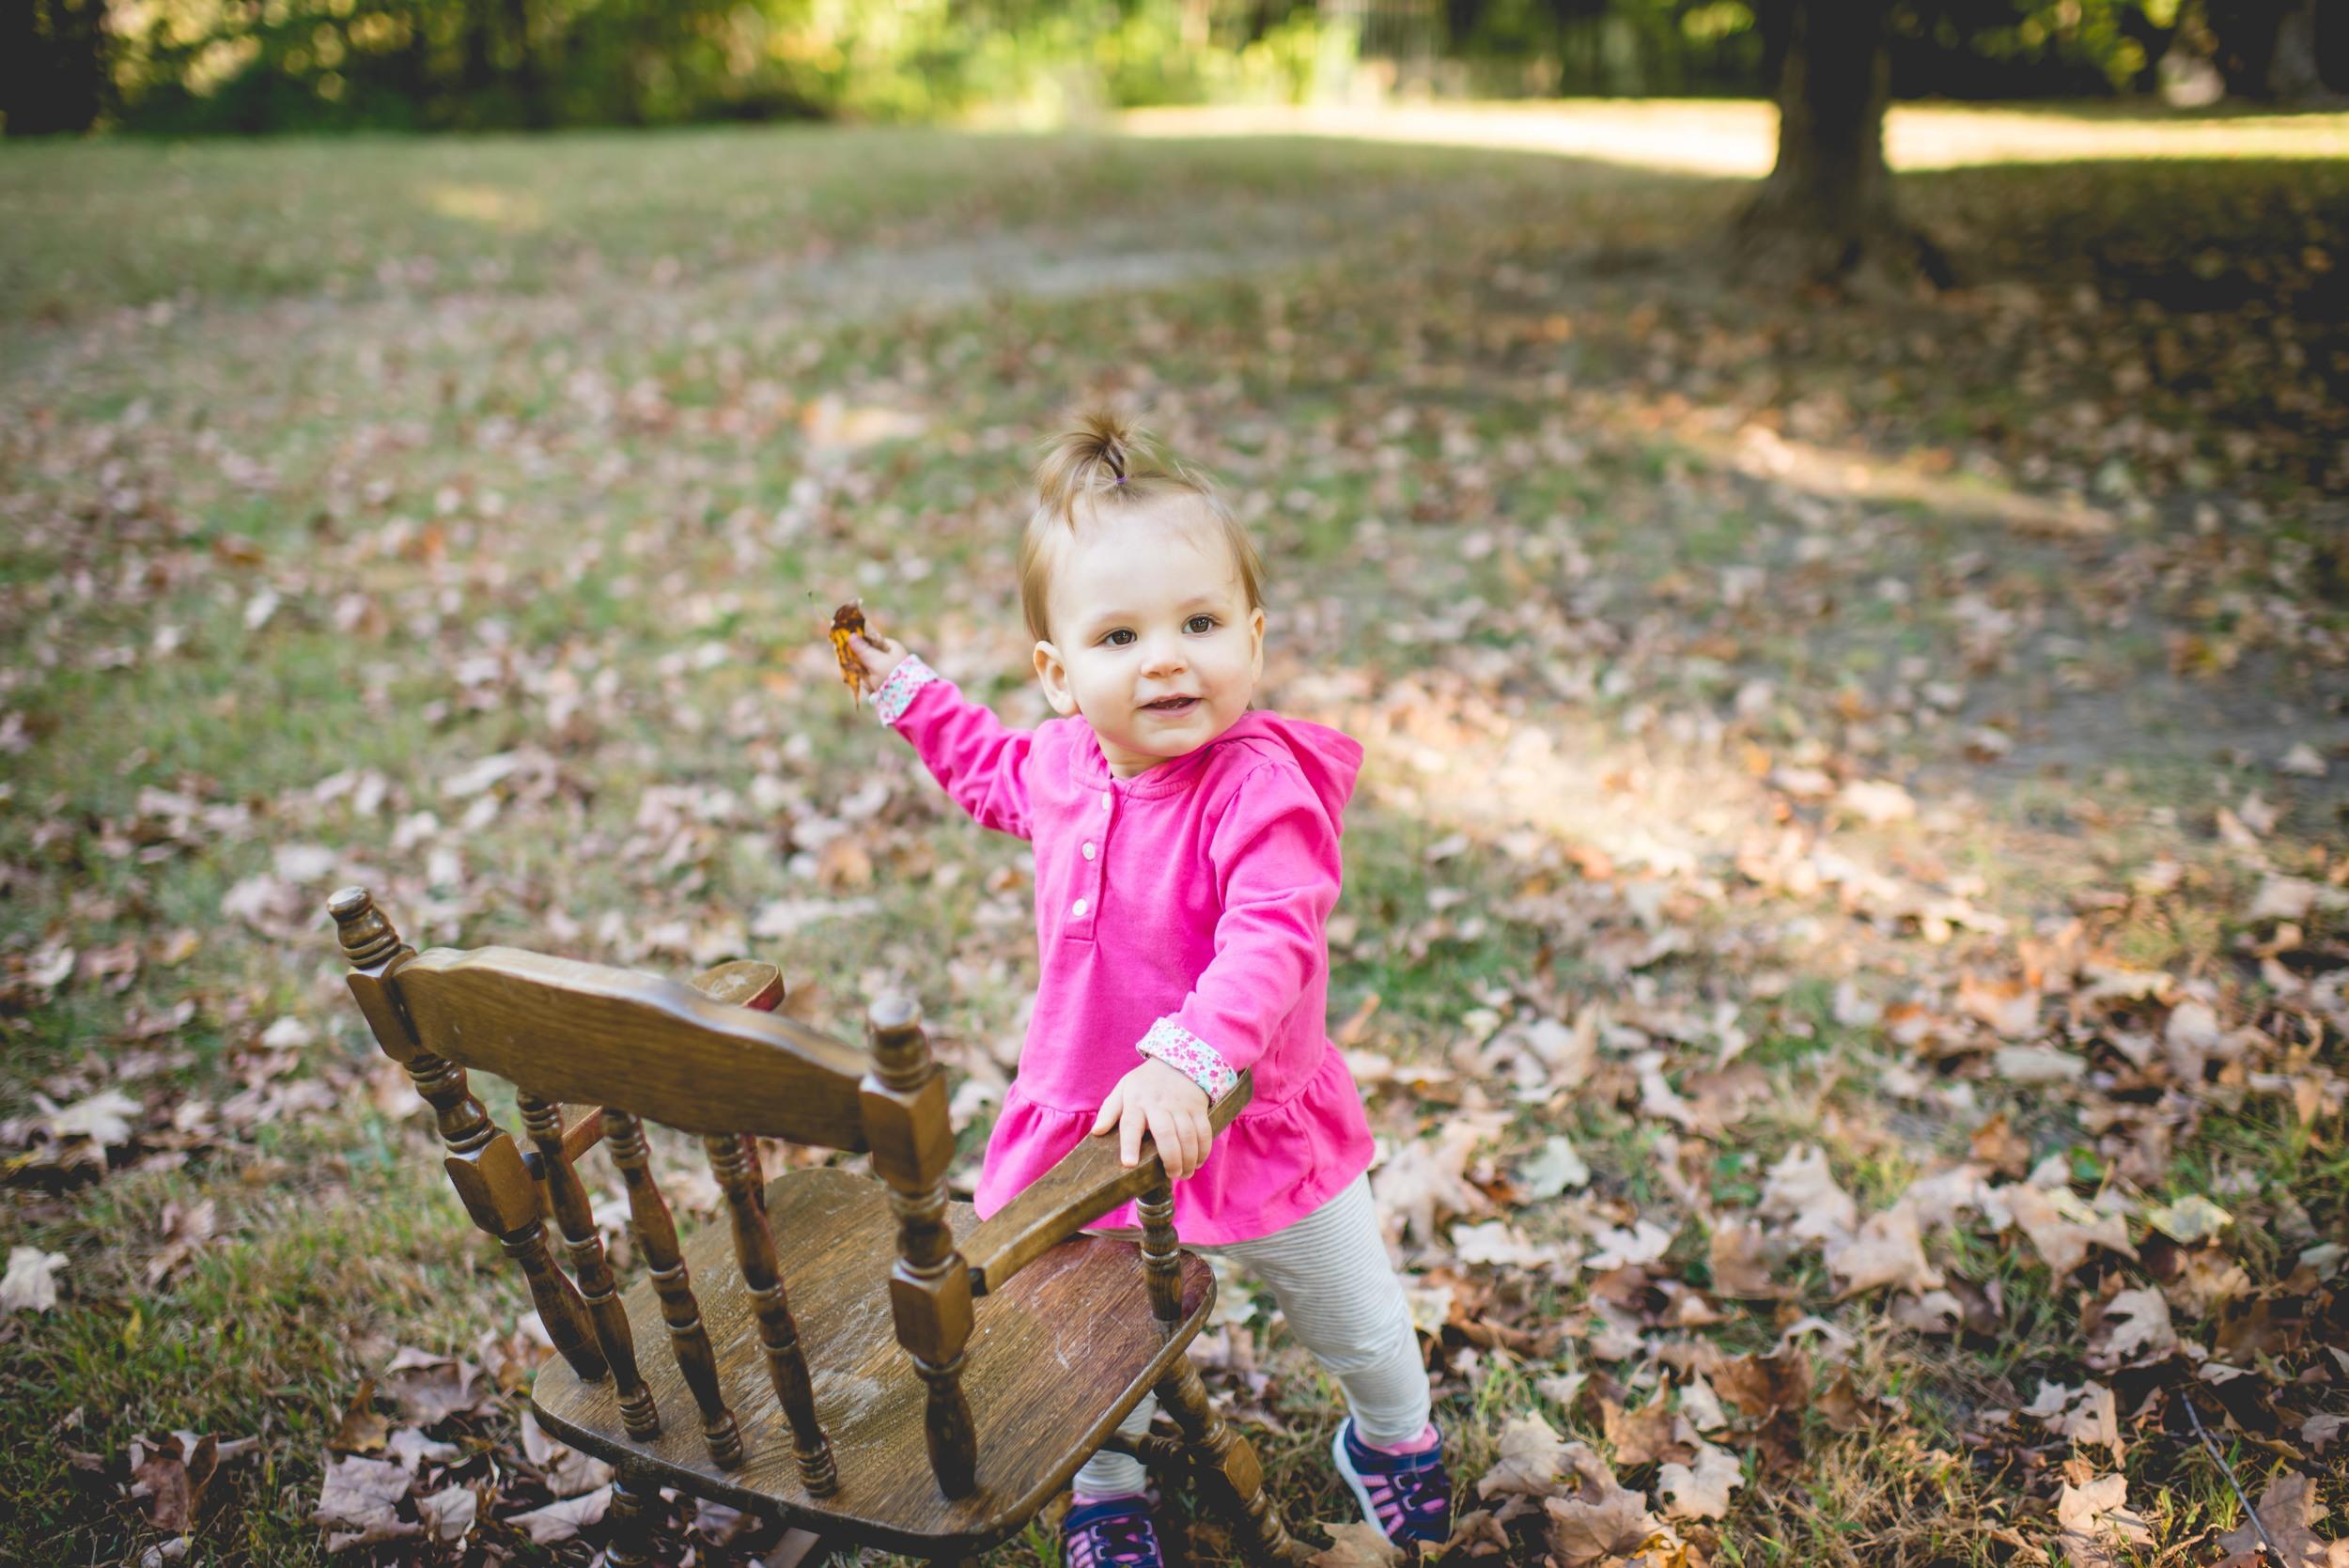 sarasutterphotography_family_MissCMaifield_2015-182.jpg